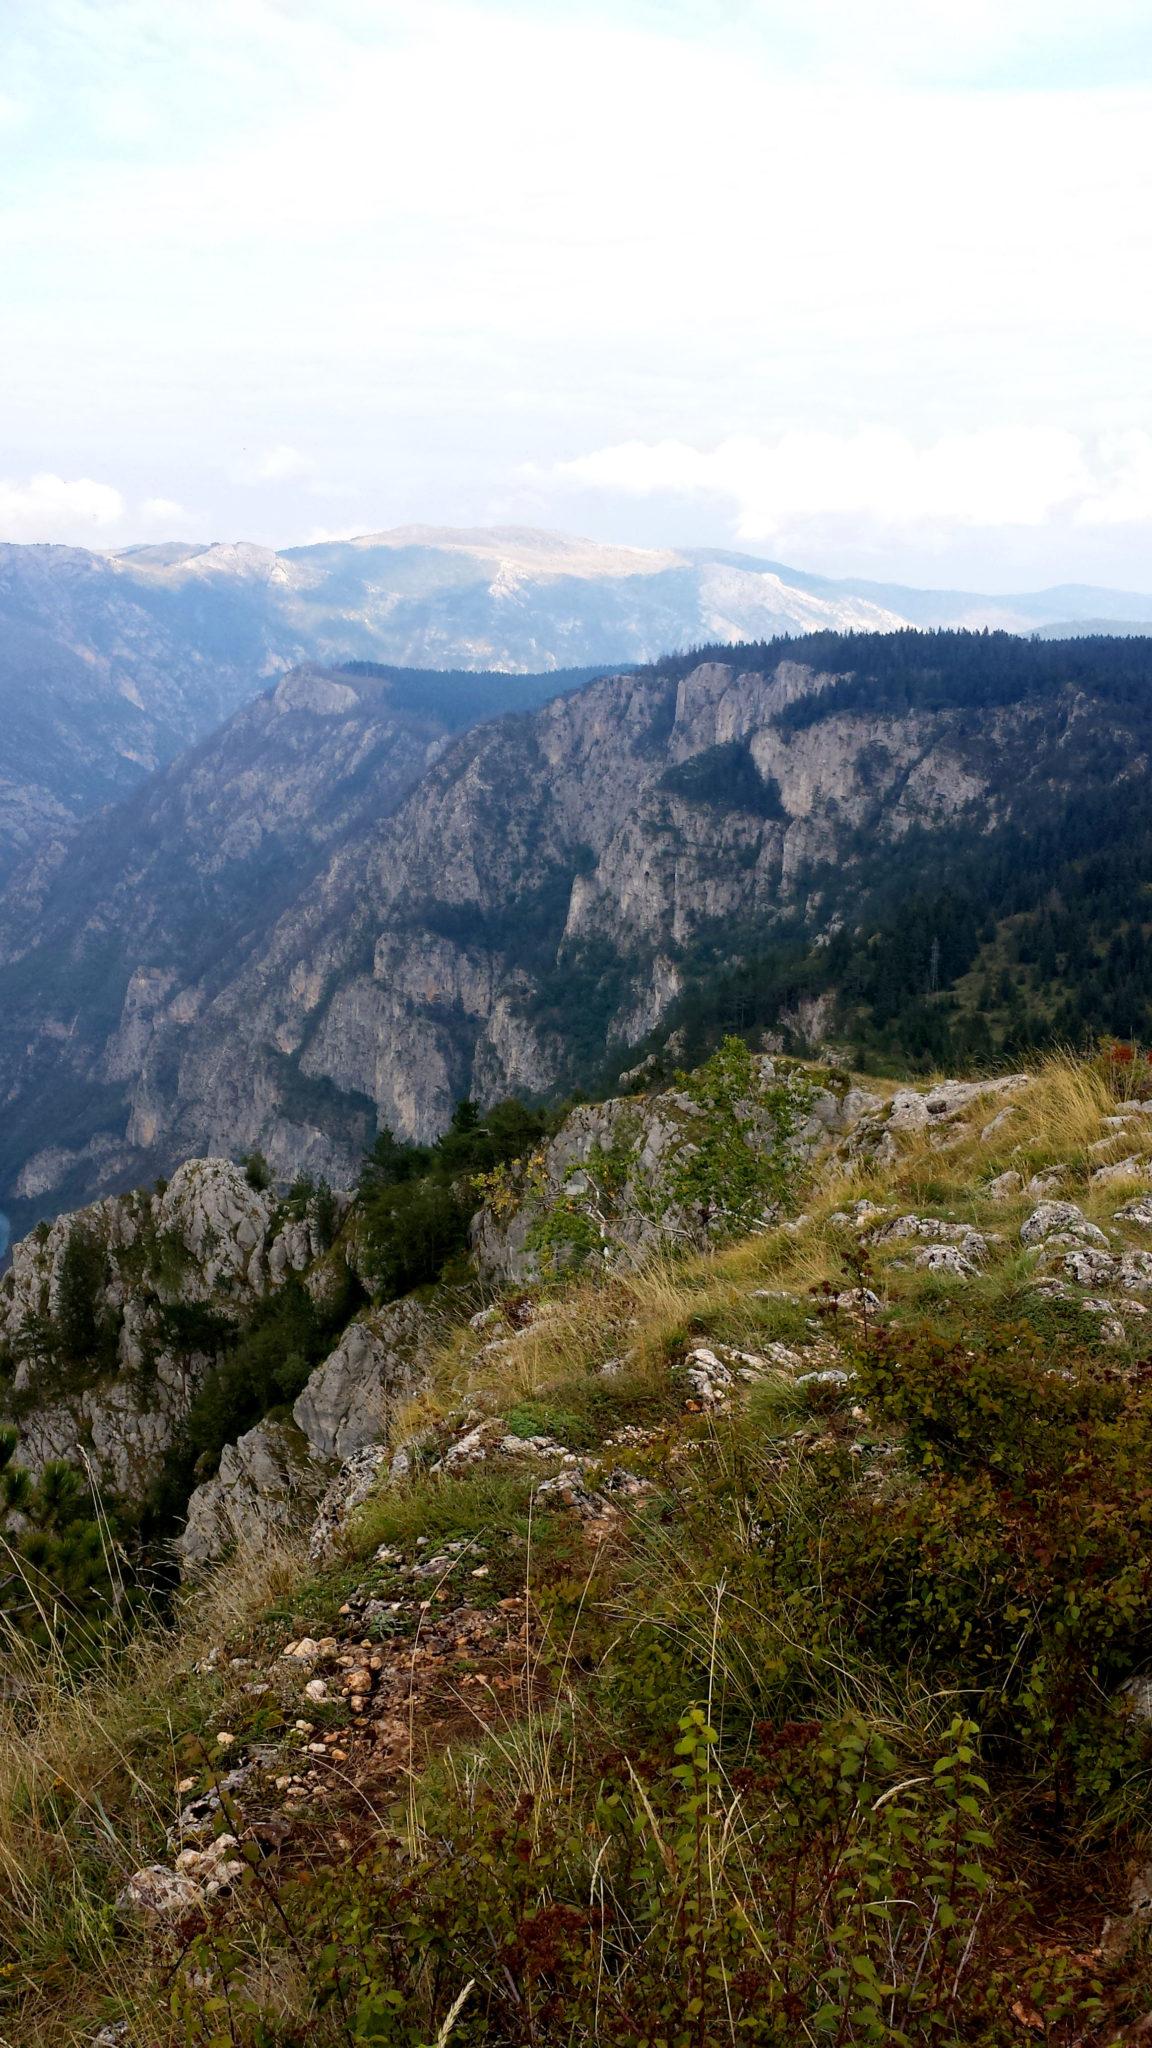 Hemaposesesvalises_montenegro_la_randonnee_champignon_voyage_travel_blog7